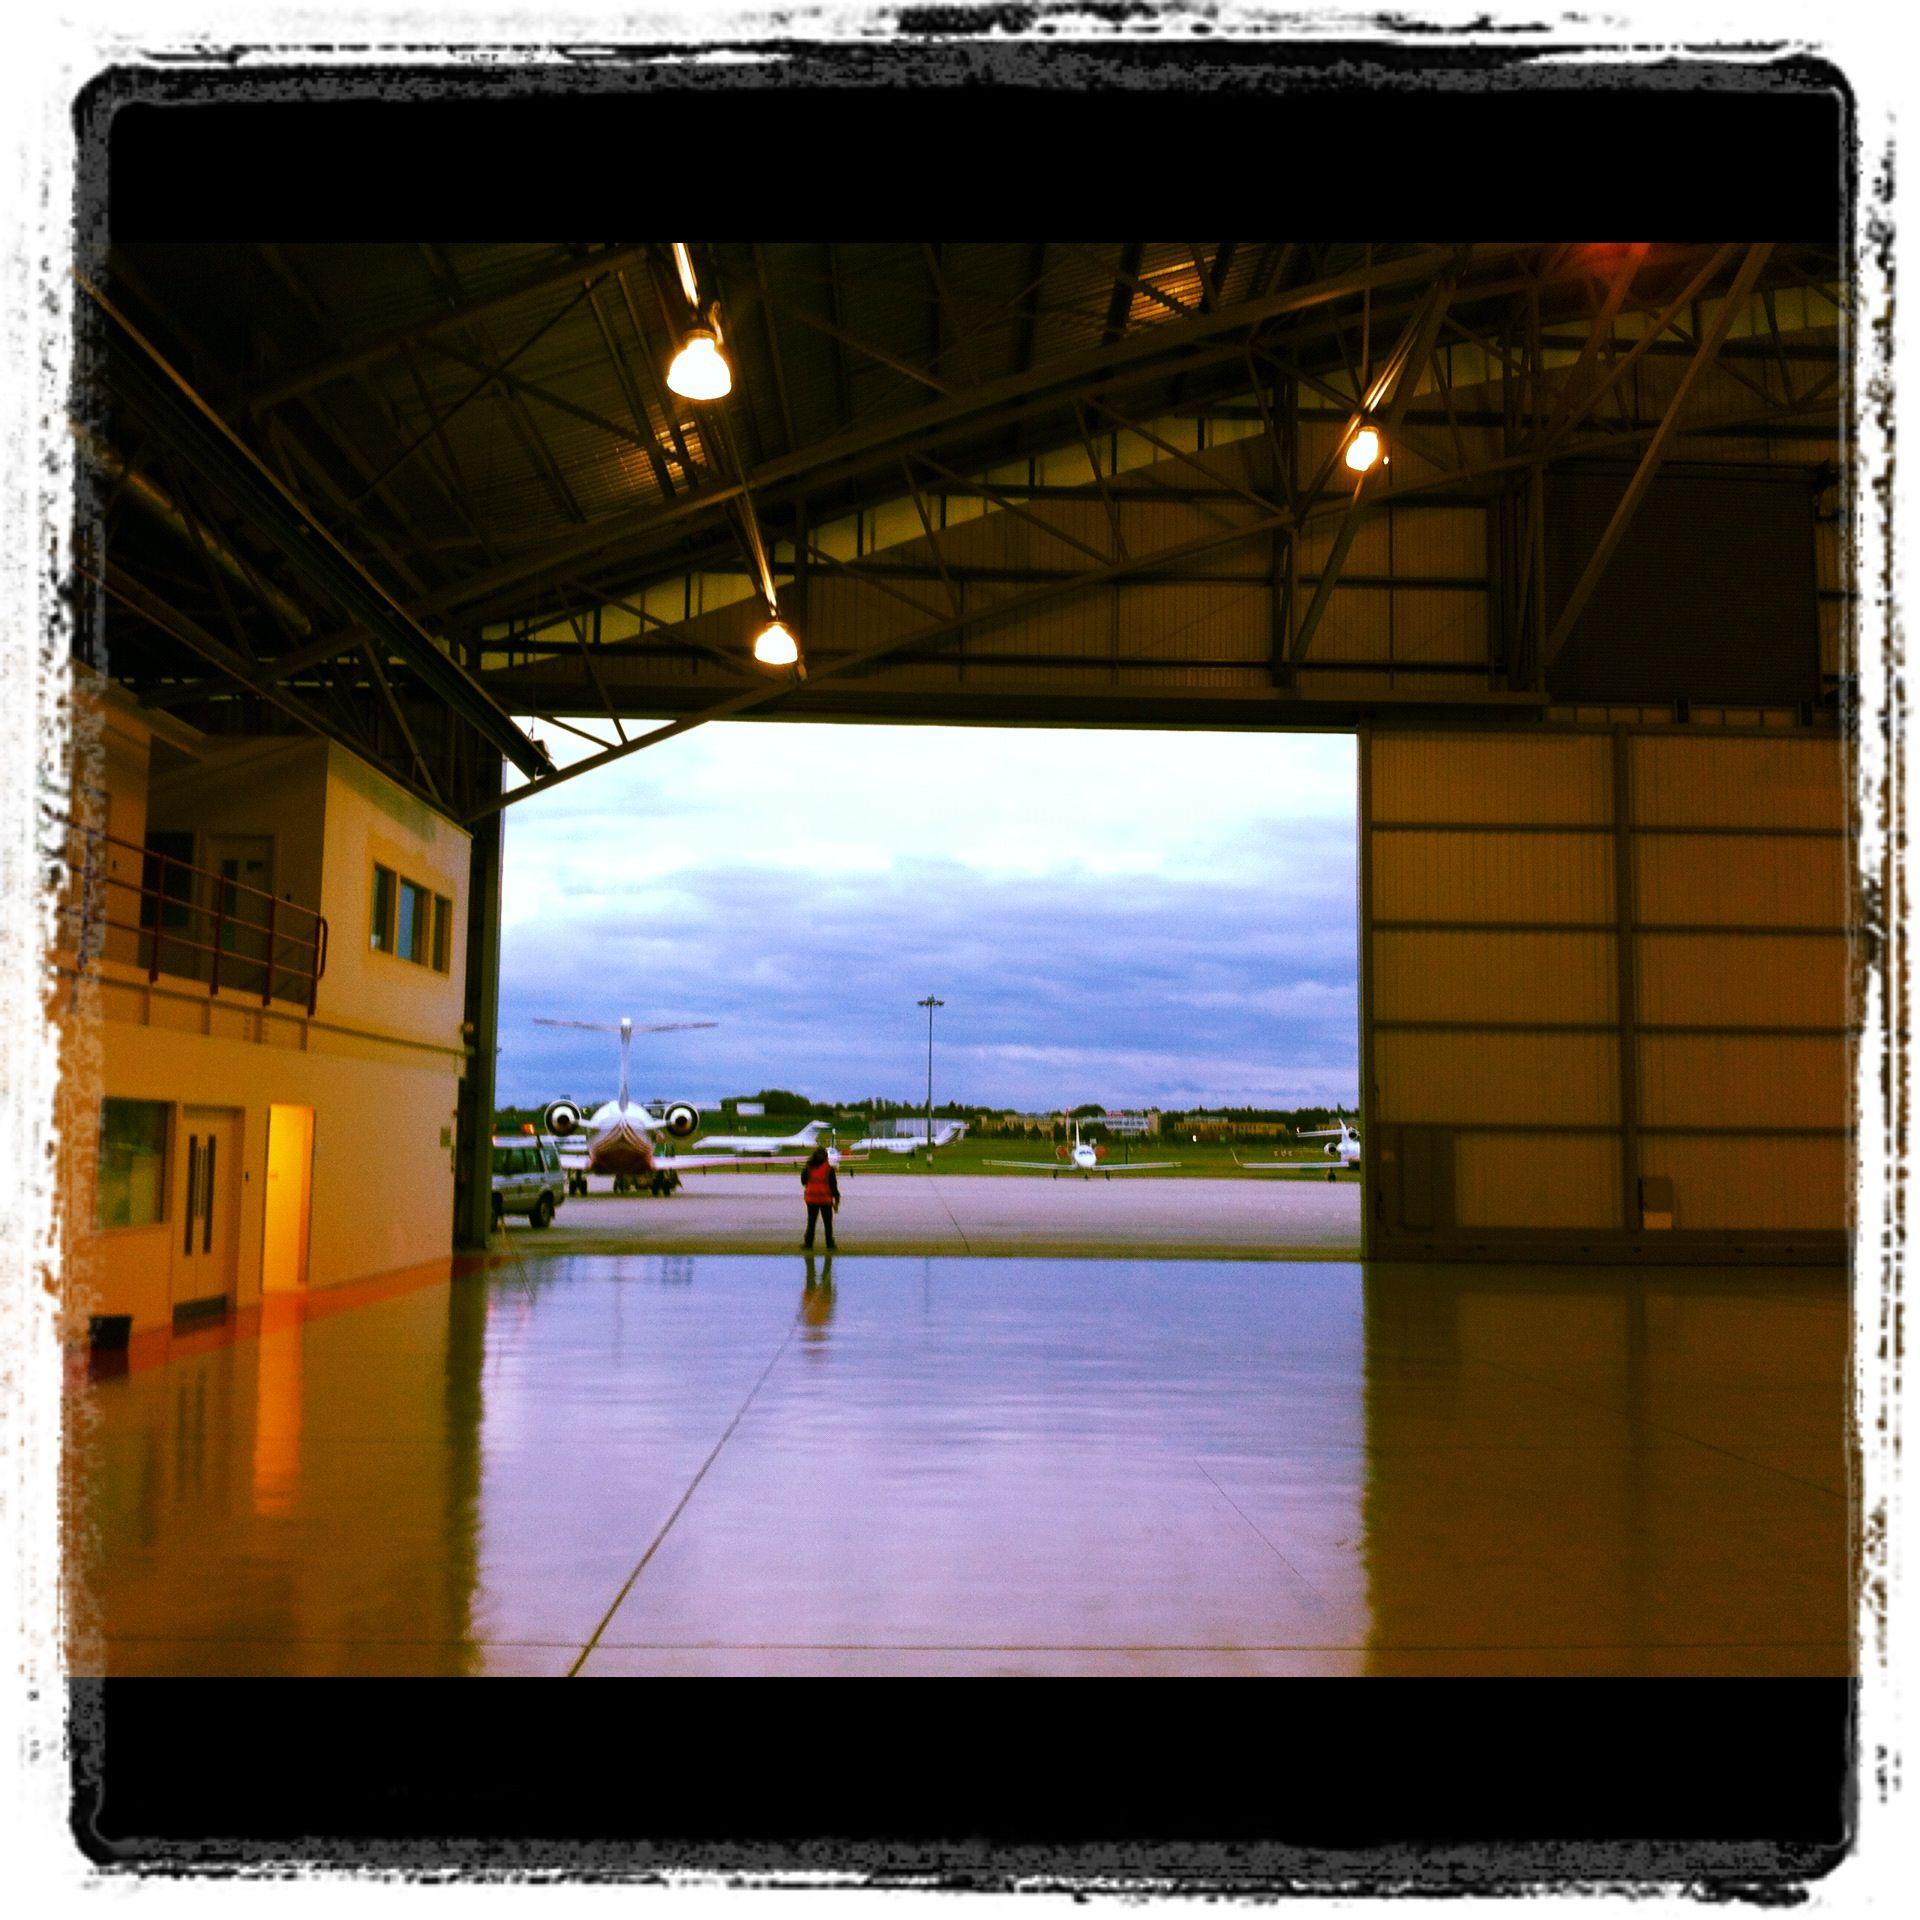 Farnborough Airport, London Ready to take off